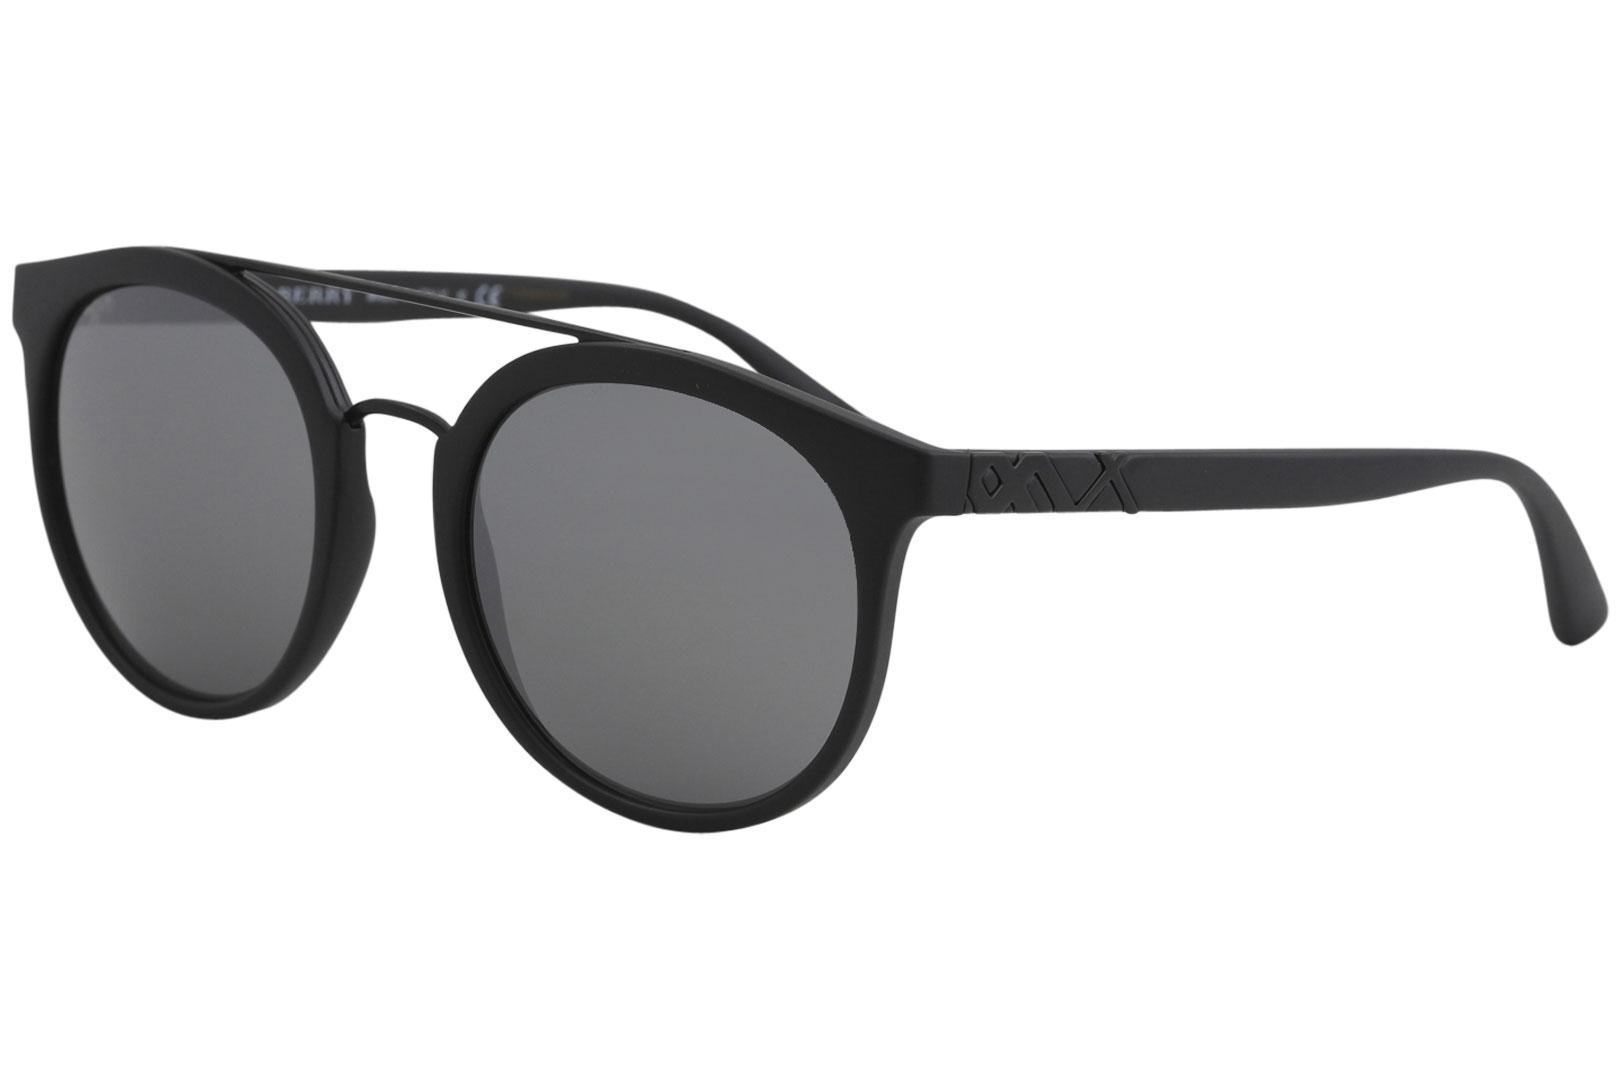 c6deeb87ee Burberry Men s BE4245 BE 4245 Fashion Round Sunglasses